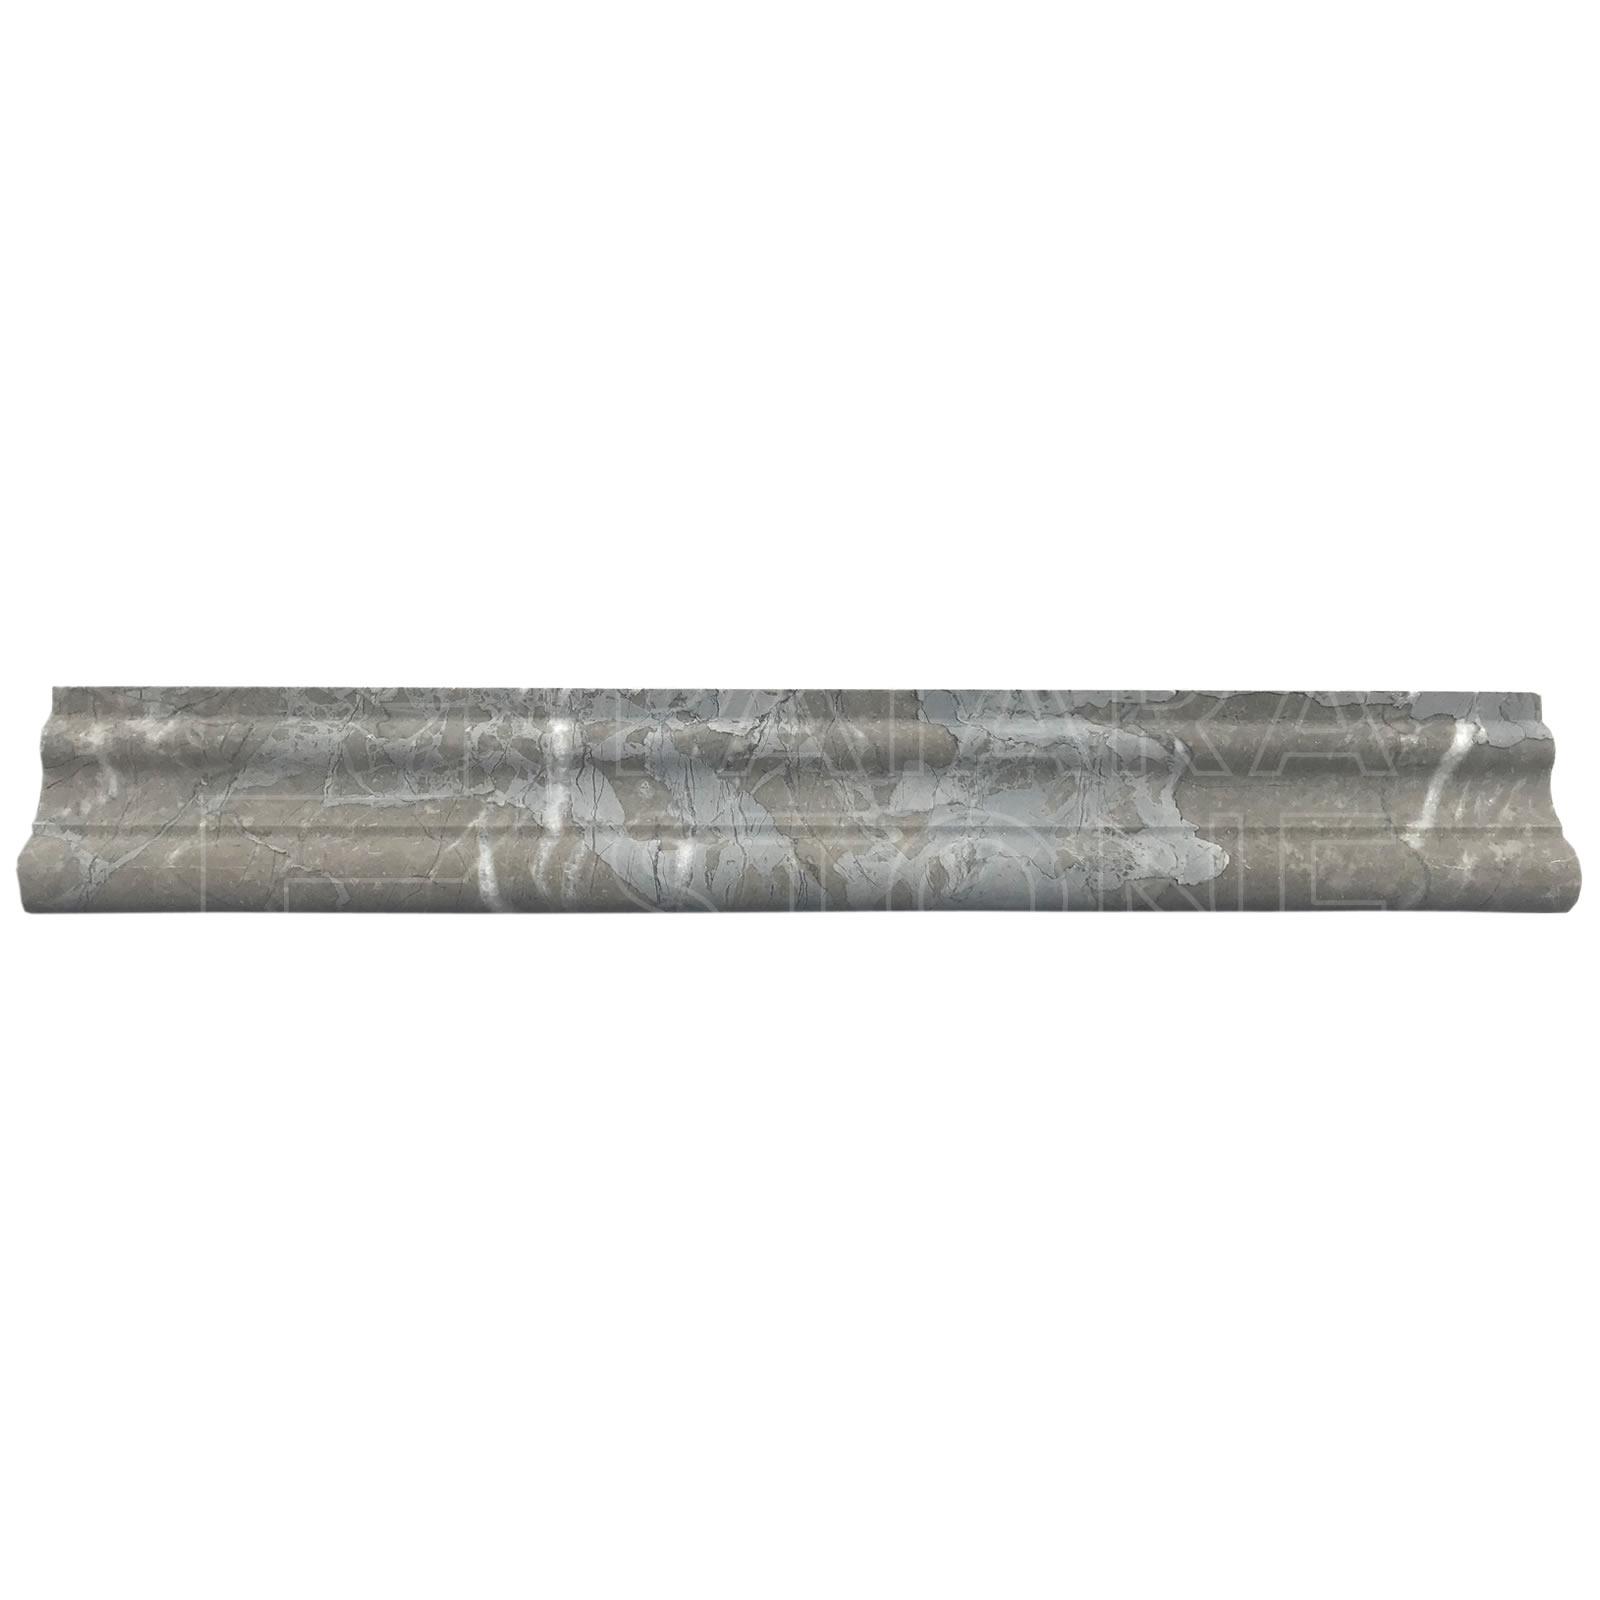 Amazon Gray Marble Honed Chair Rail 2x12 Patara Stone